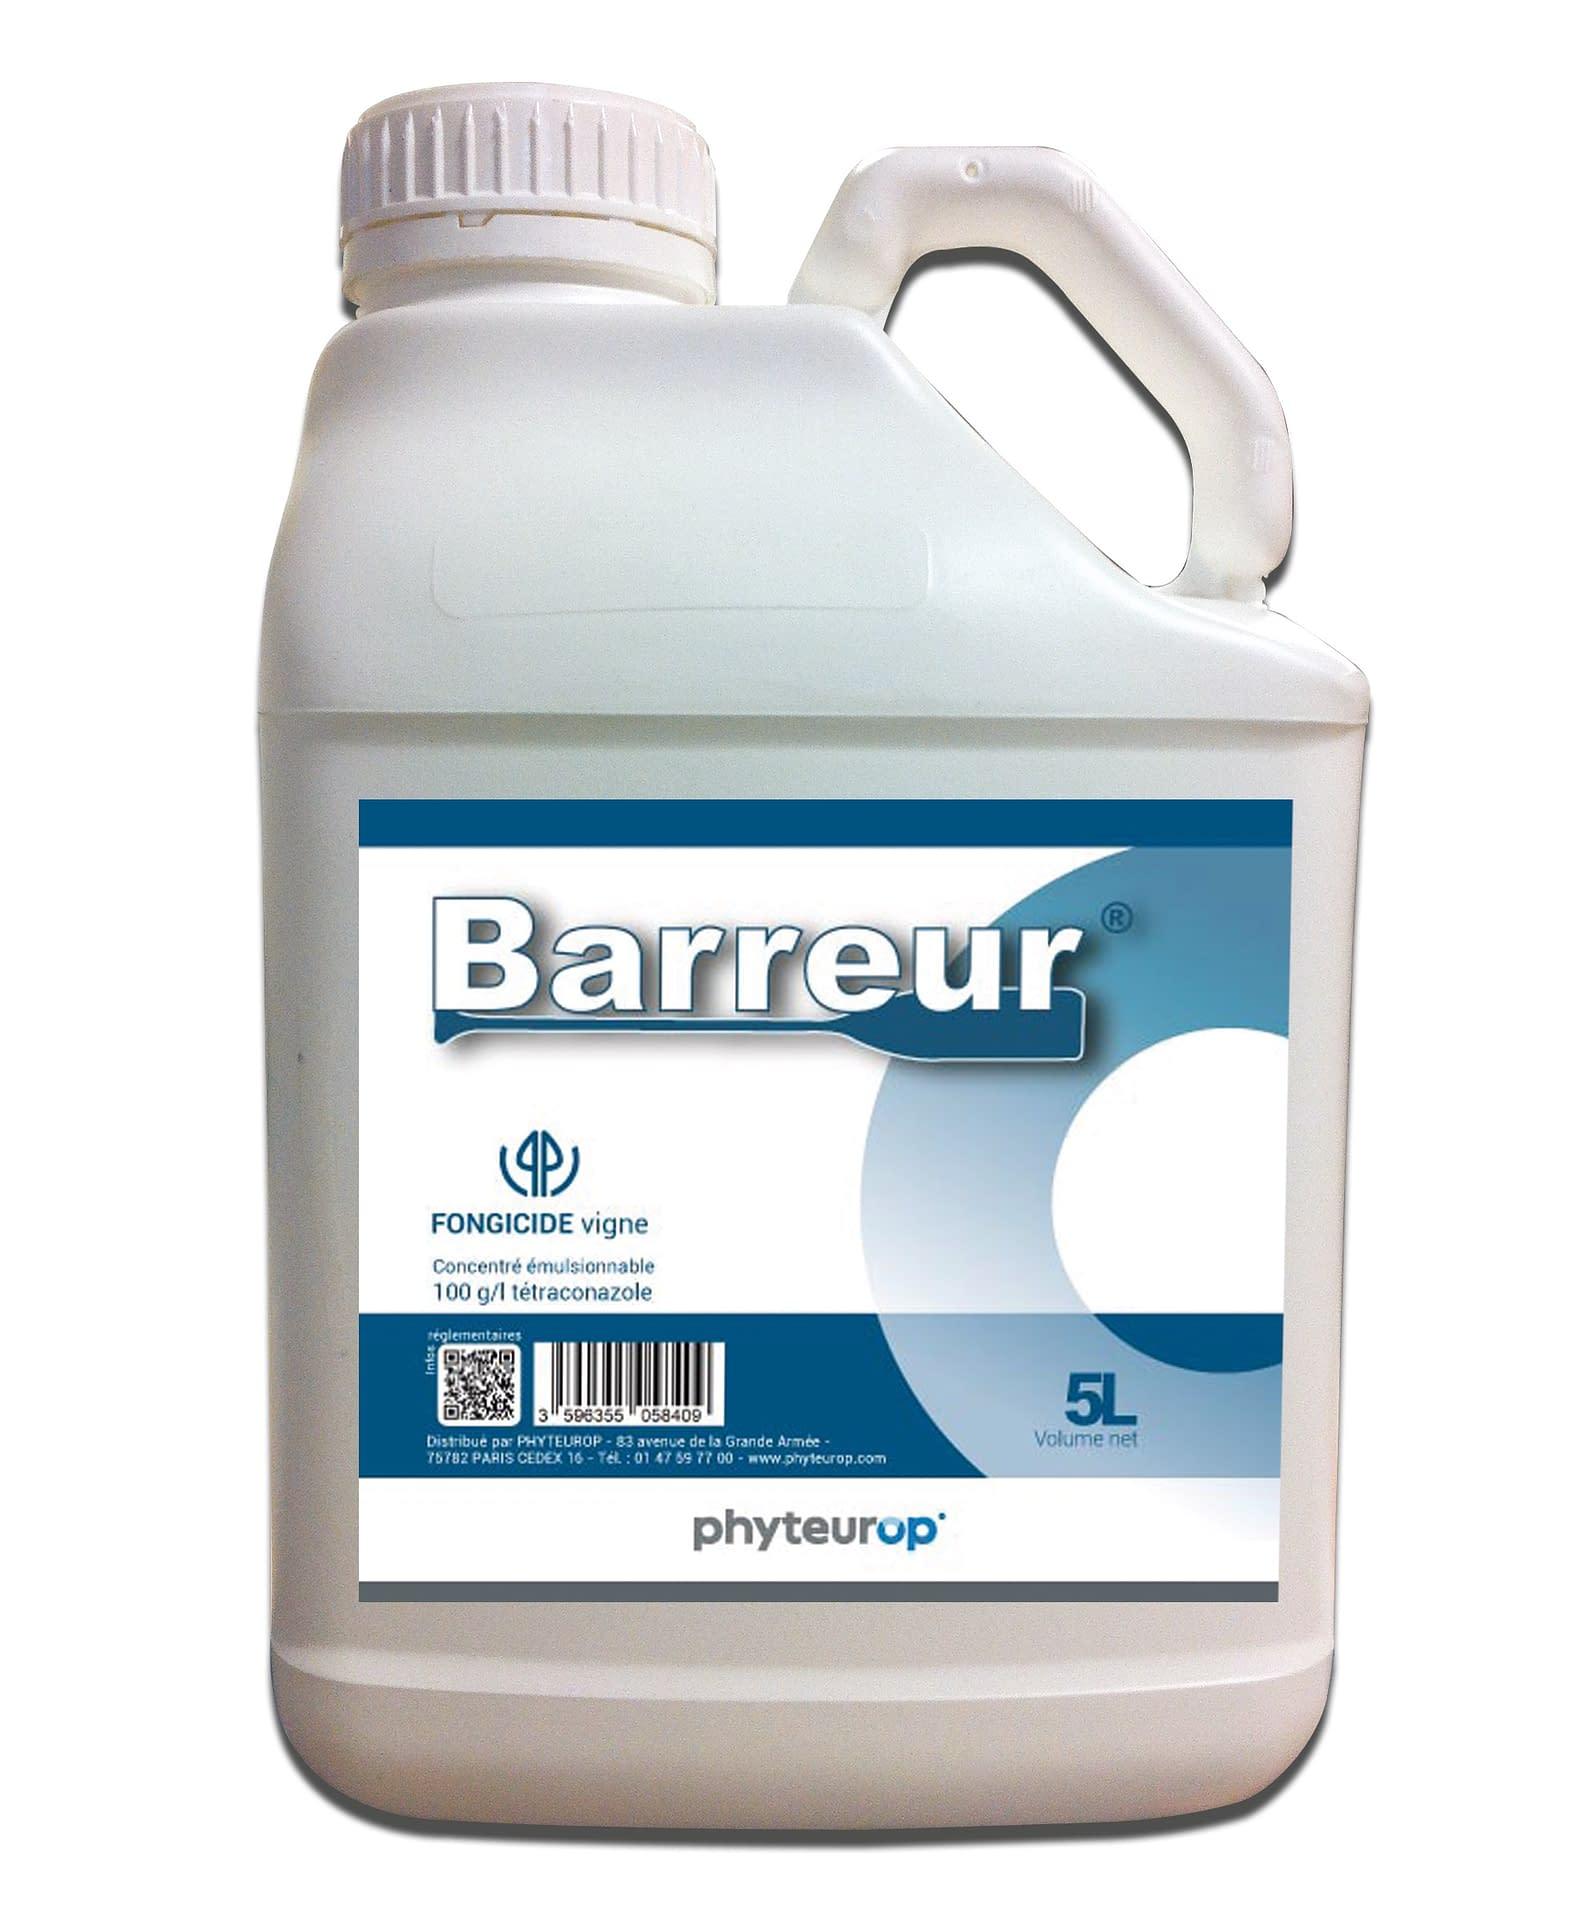 Phyteurop_3596355058409-Barreur-5L